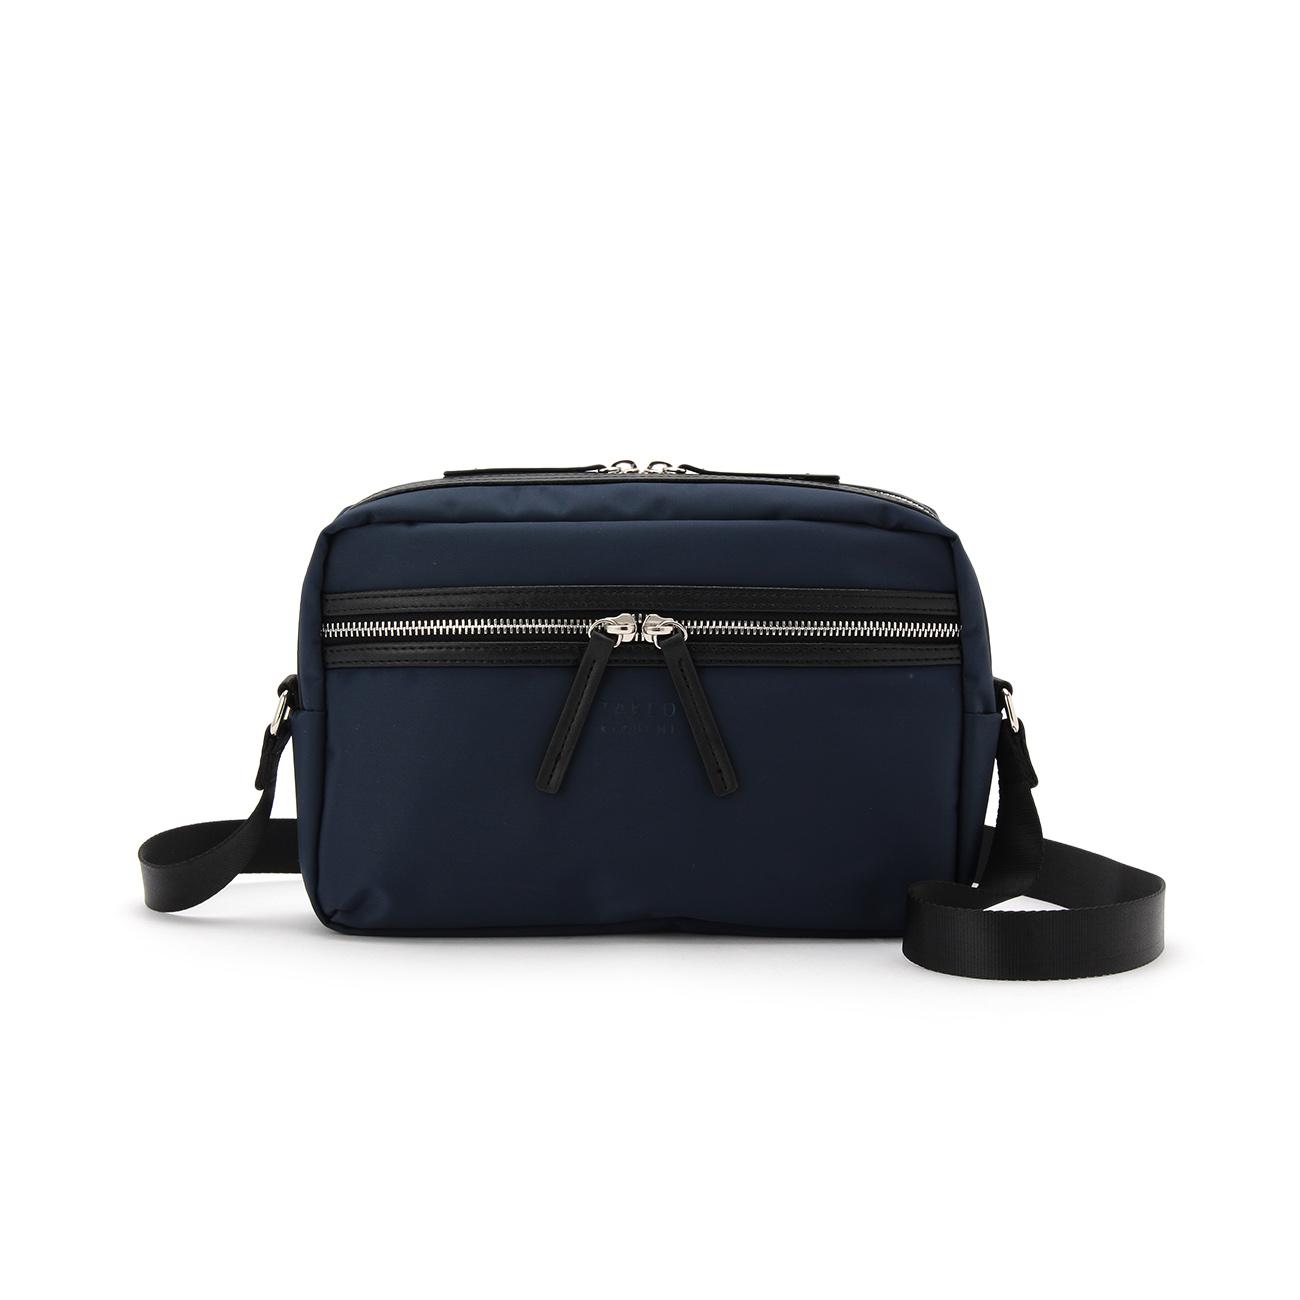 TAKEO KIKUCHI (タケオキクチ) ボディサコショルダーバッグ